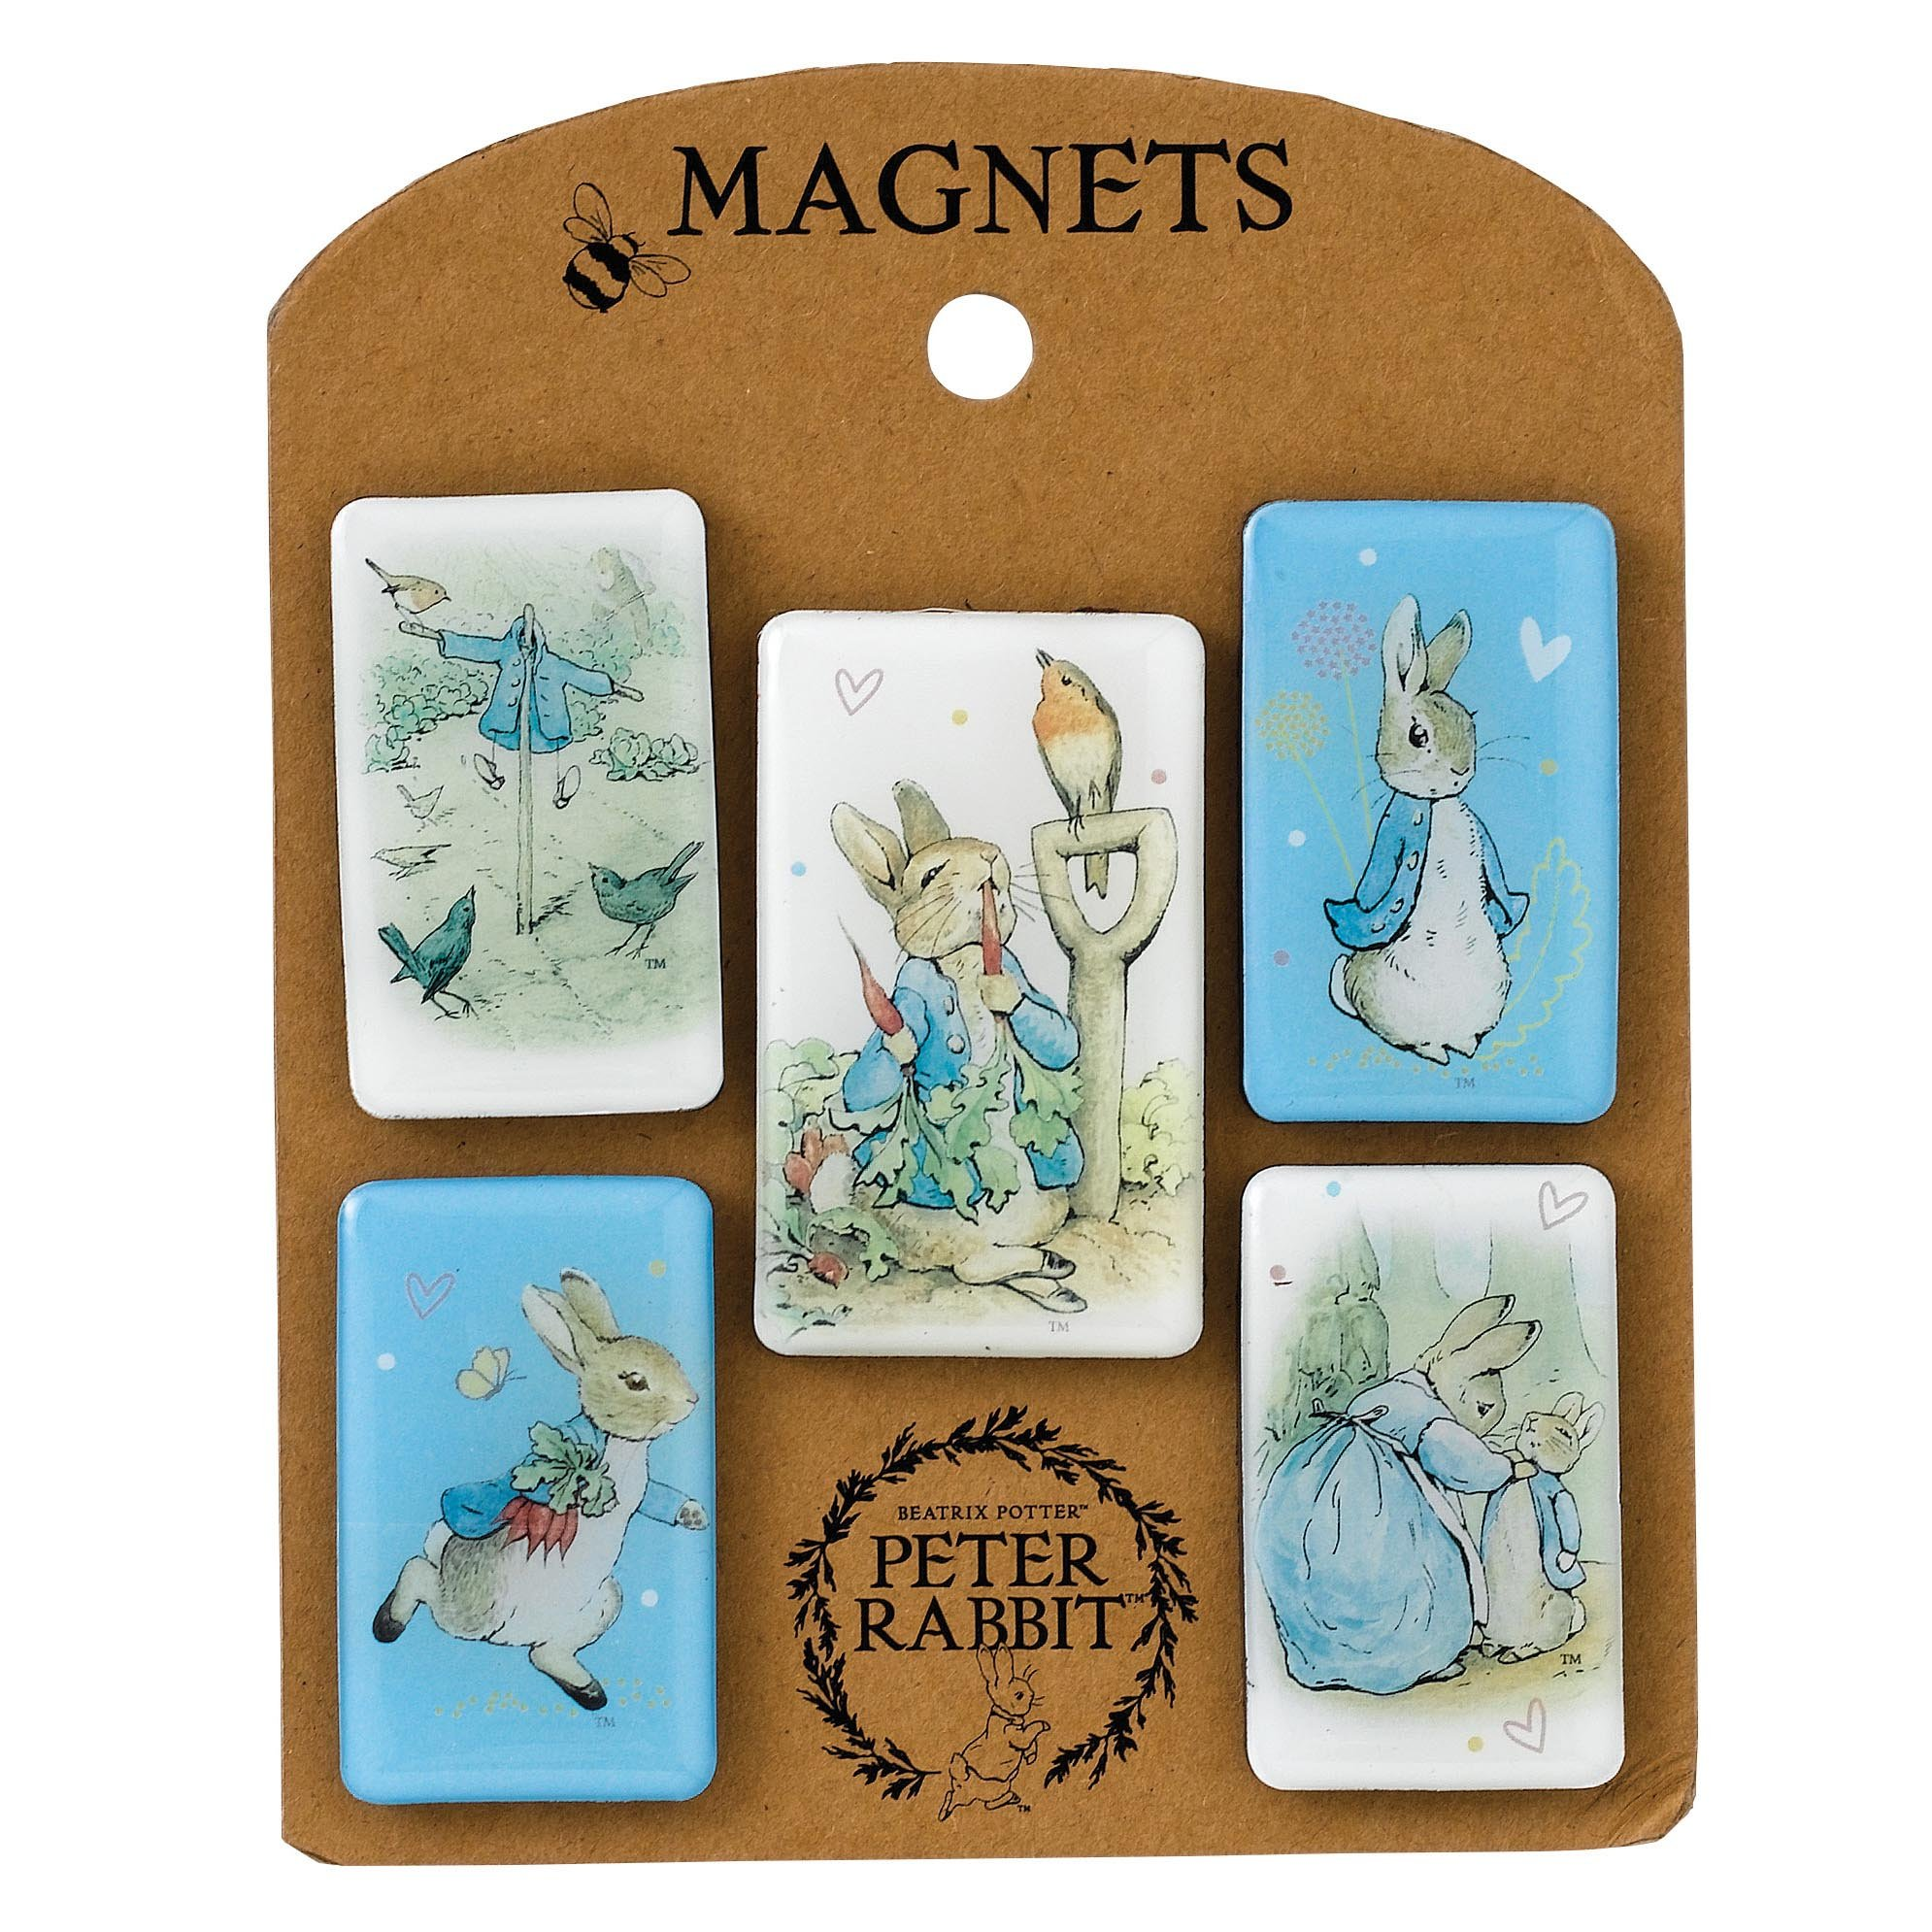 Luck Beatrix Potter Peter Rabbit Magnet Set